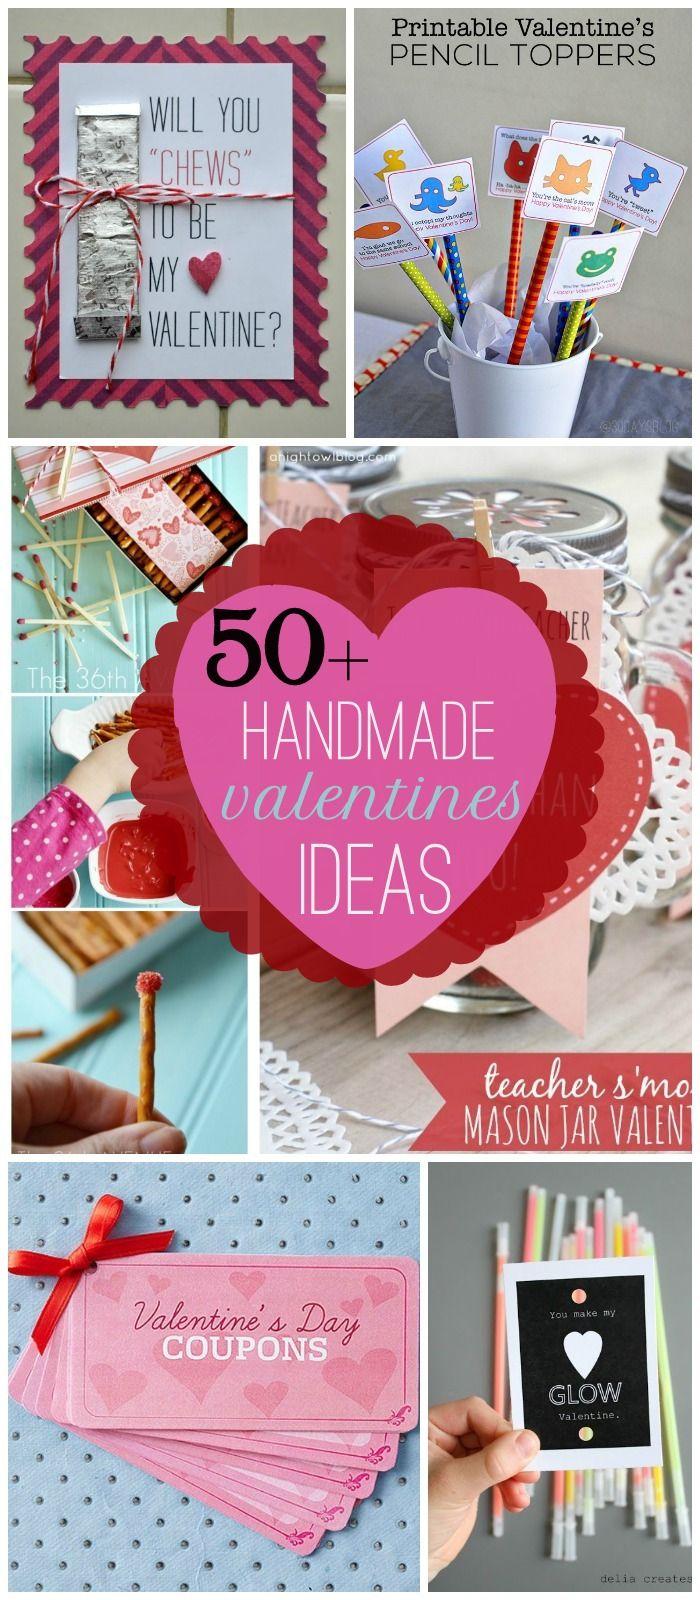 50+ Handmade Valentines Ideas